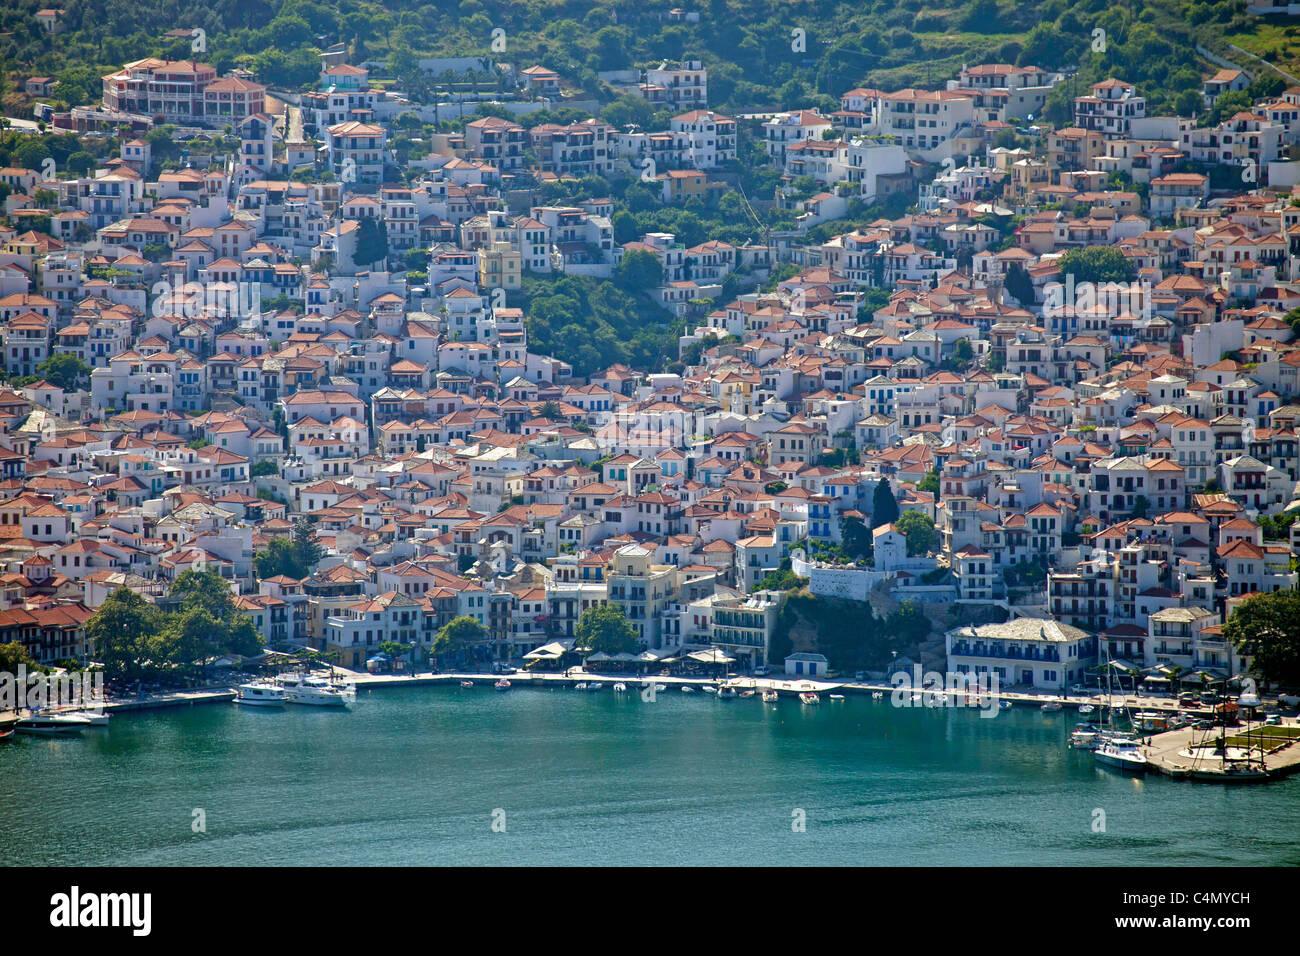 Birds Eye view of Skopelos Town and harbour, Skopelos Island, Northern Sporades, Greece Stock Photo